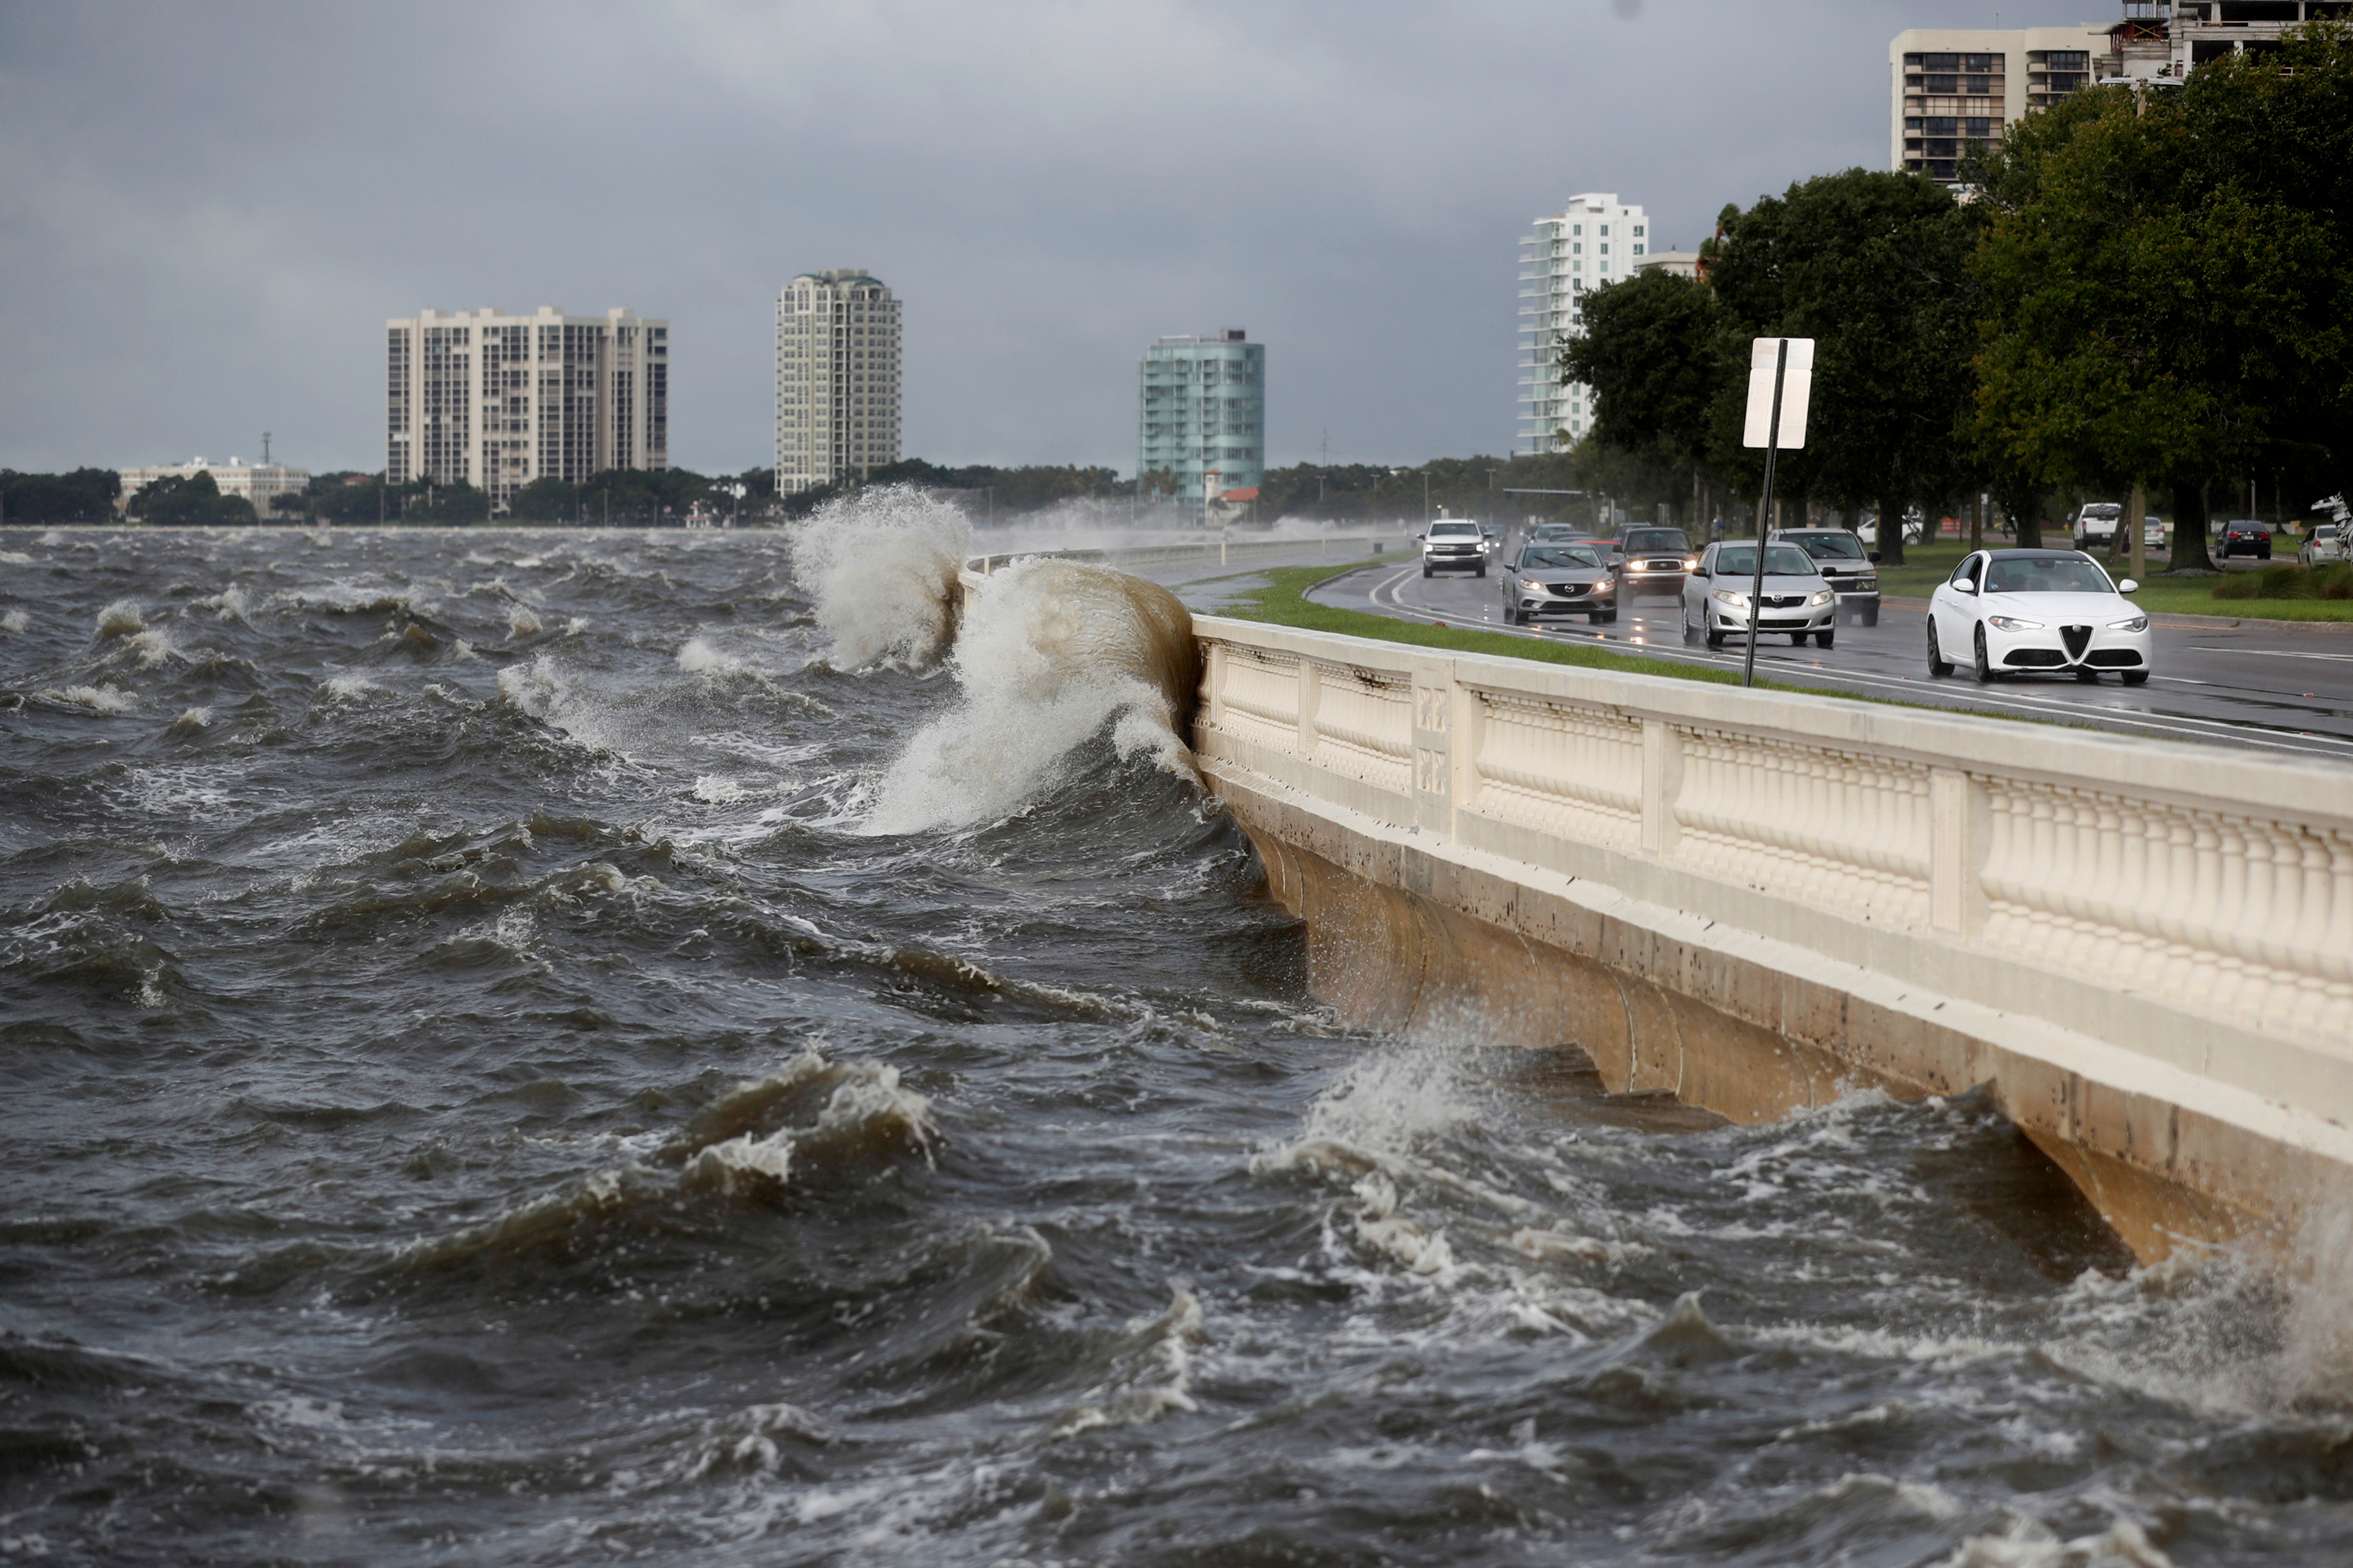 Waves crash the balustrades on Bayshore Boulevard during high tide after Tropical Storm Elsa churns up the Gulf coast, in Tampa, Florida, U.S., July 7, 2021. REUTERS/Octavio Jones/File Photo